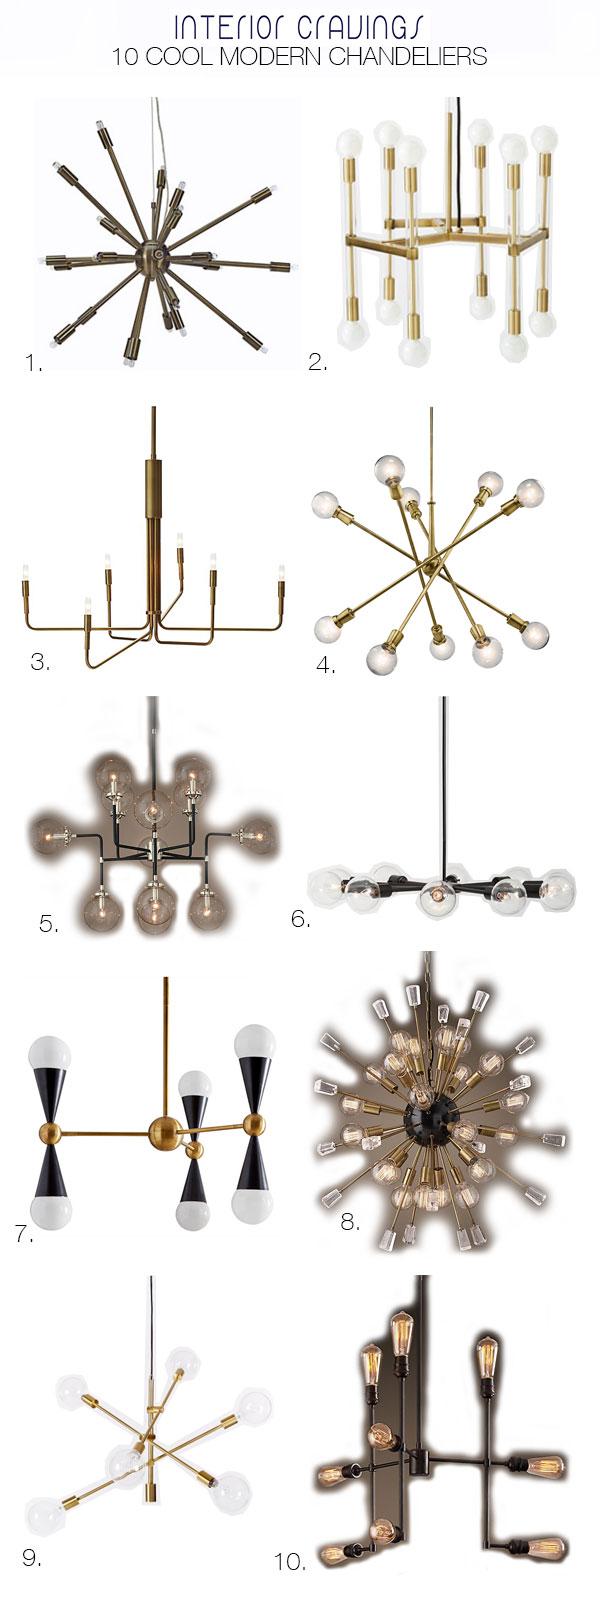 10-cool-modern-chandeliers